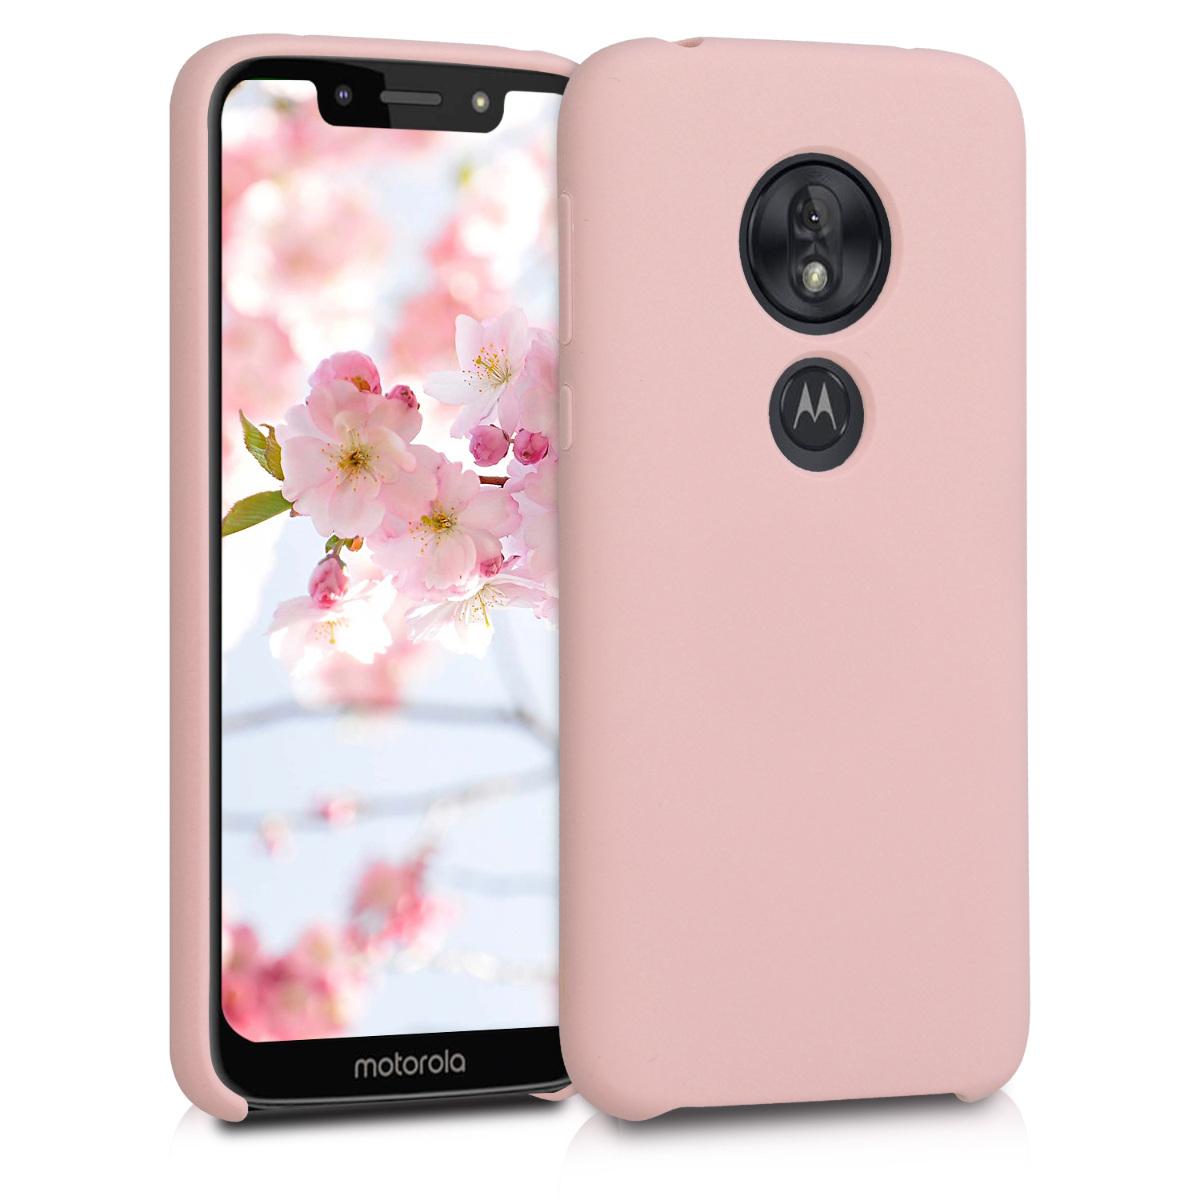 KW Θήκη Σιλικόνης Motorola Moto G7 Play - Soft Flexible Rubber Protective Cover - Dusty Pink (48631.10)